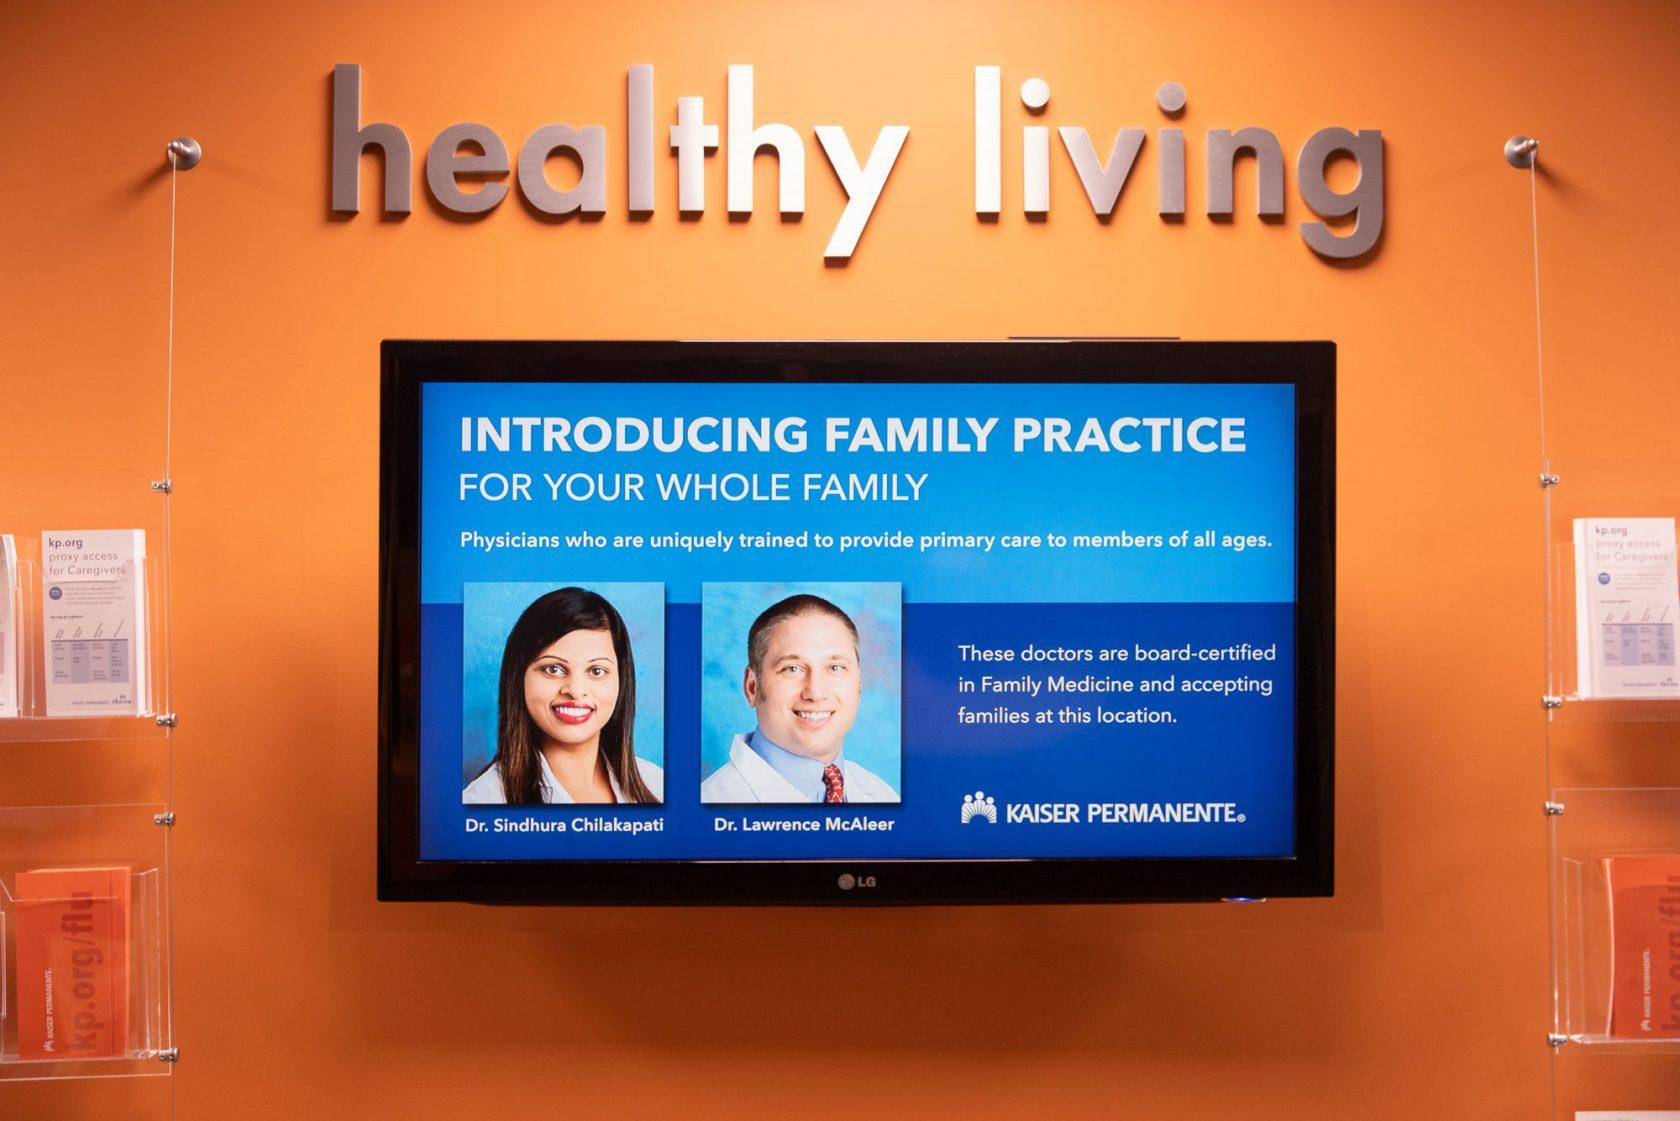 Kaiser Permanente - Healthy Living